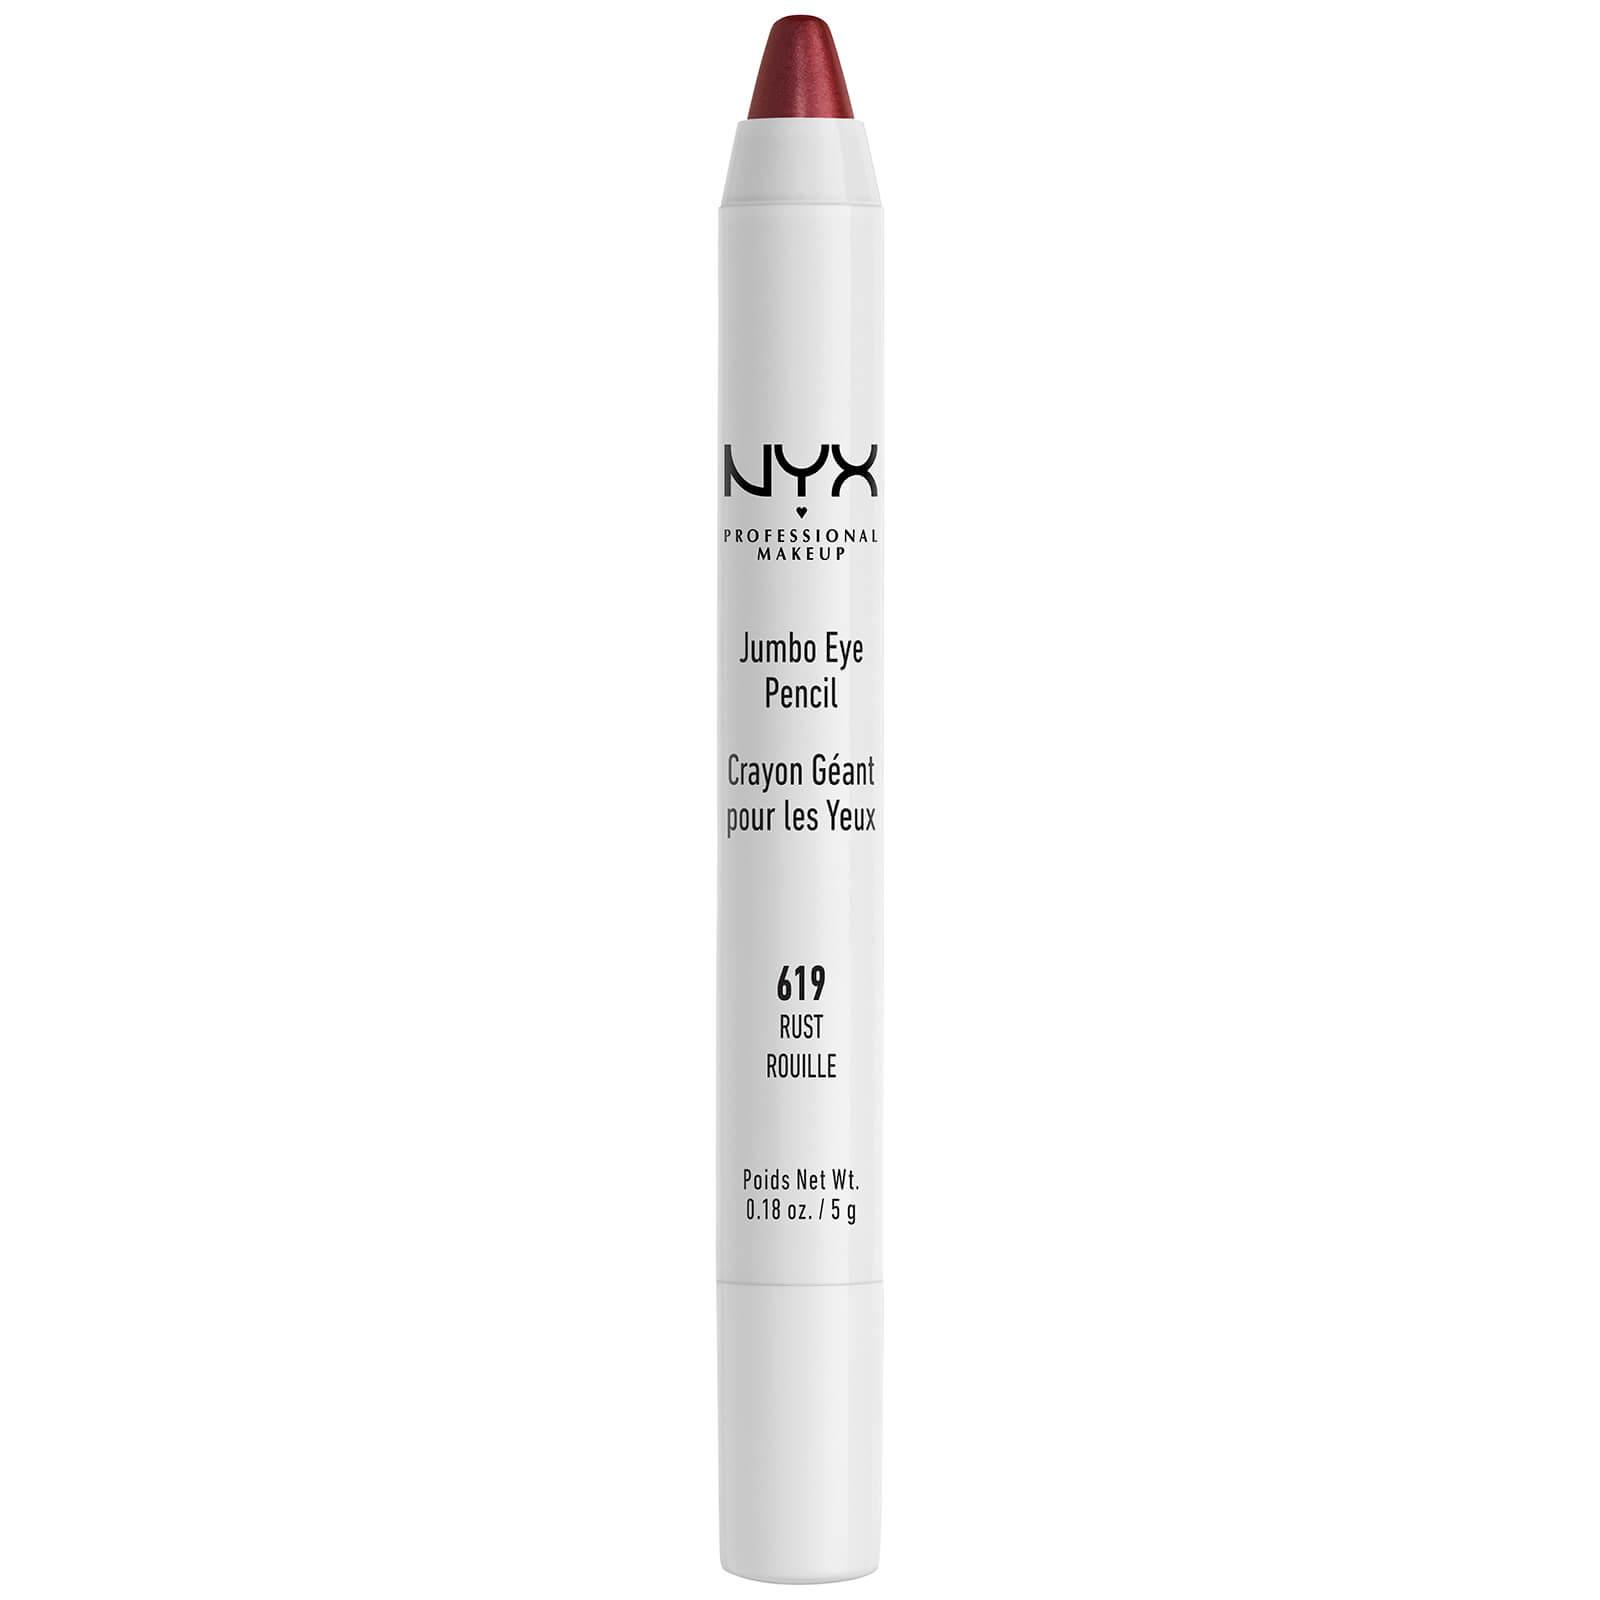 NYX Professional Makeup Jumbo Eye Pencil (Various Shades) - Rust